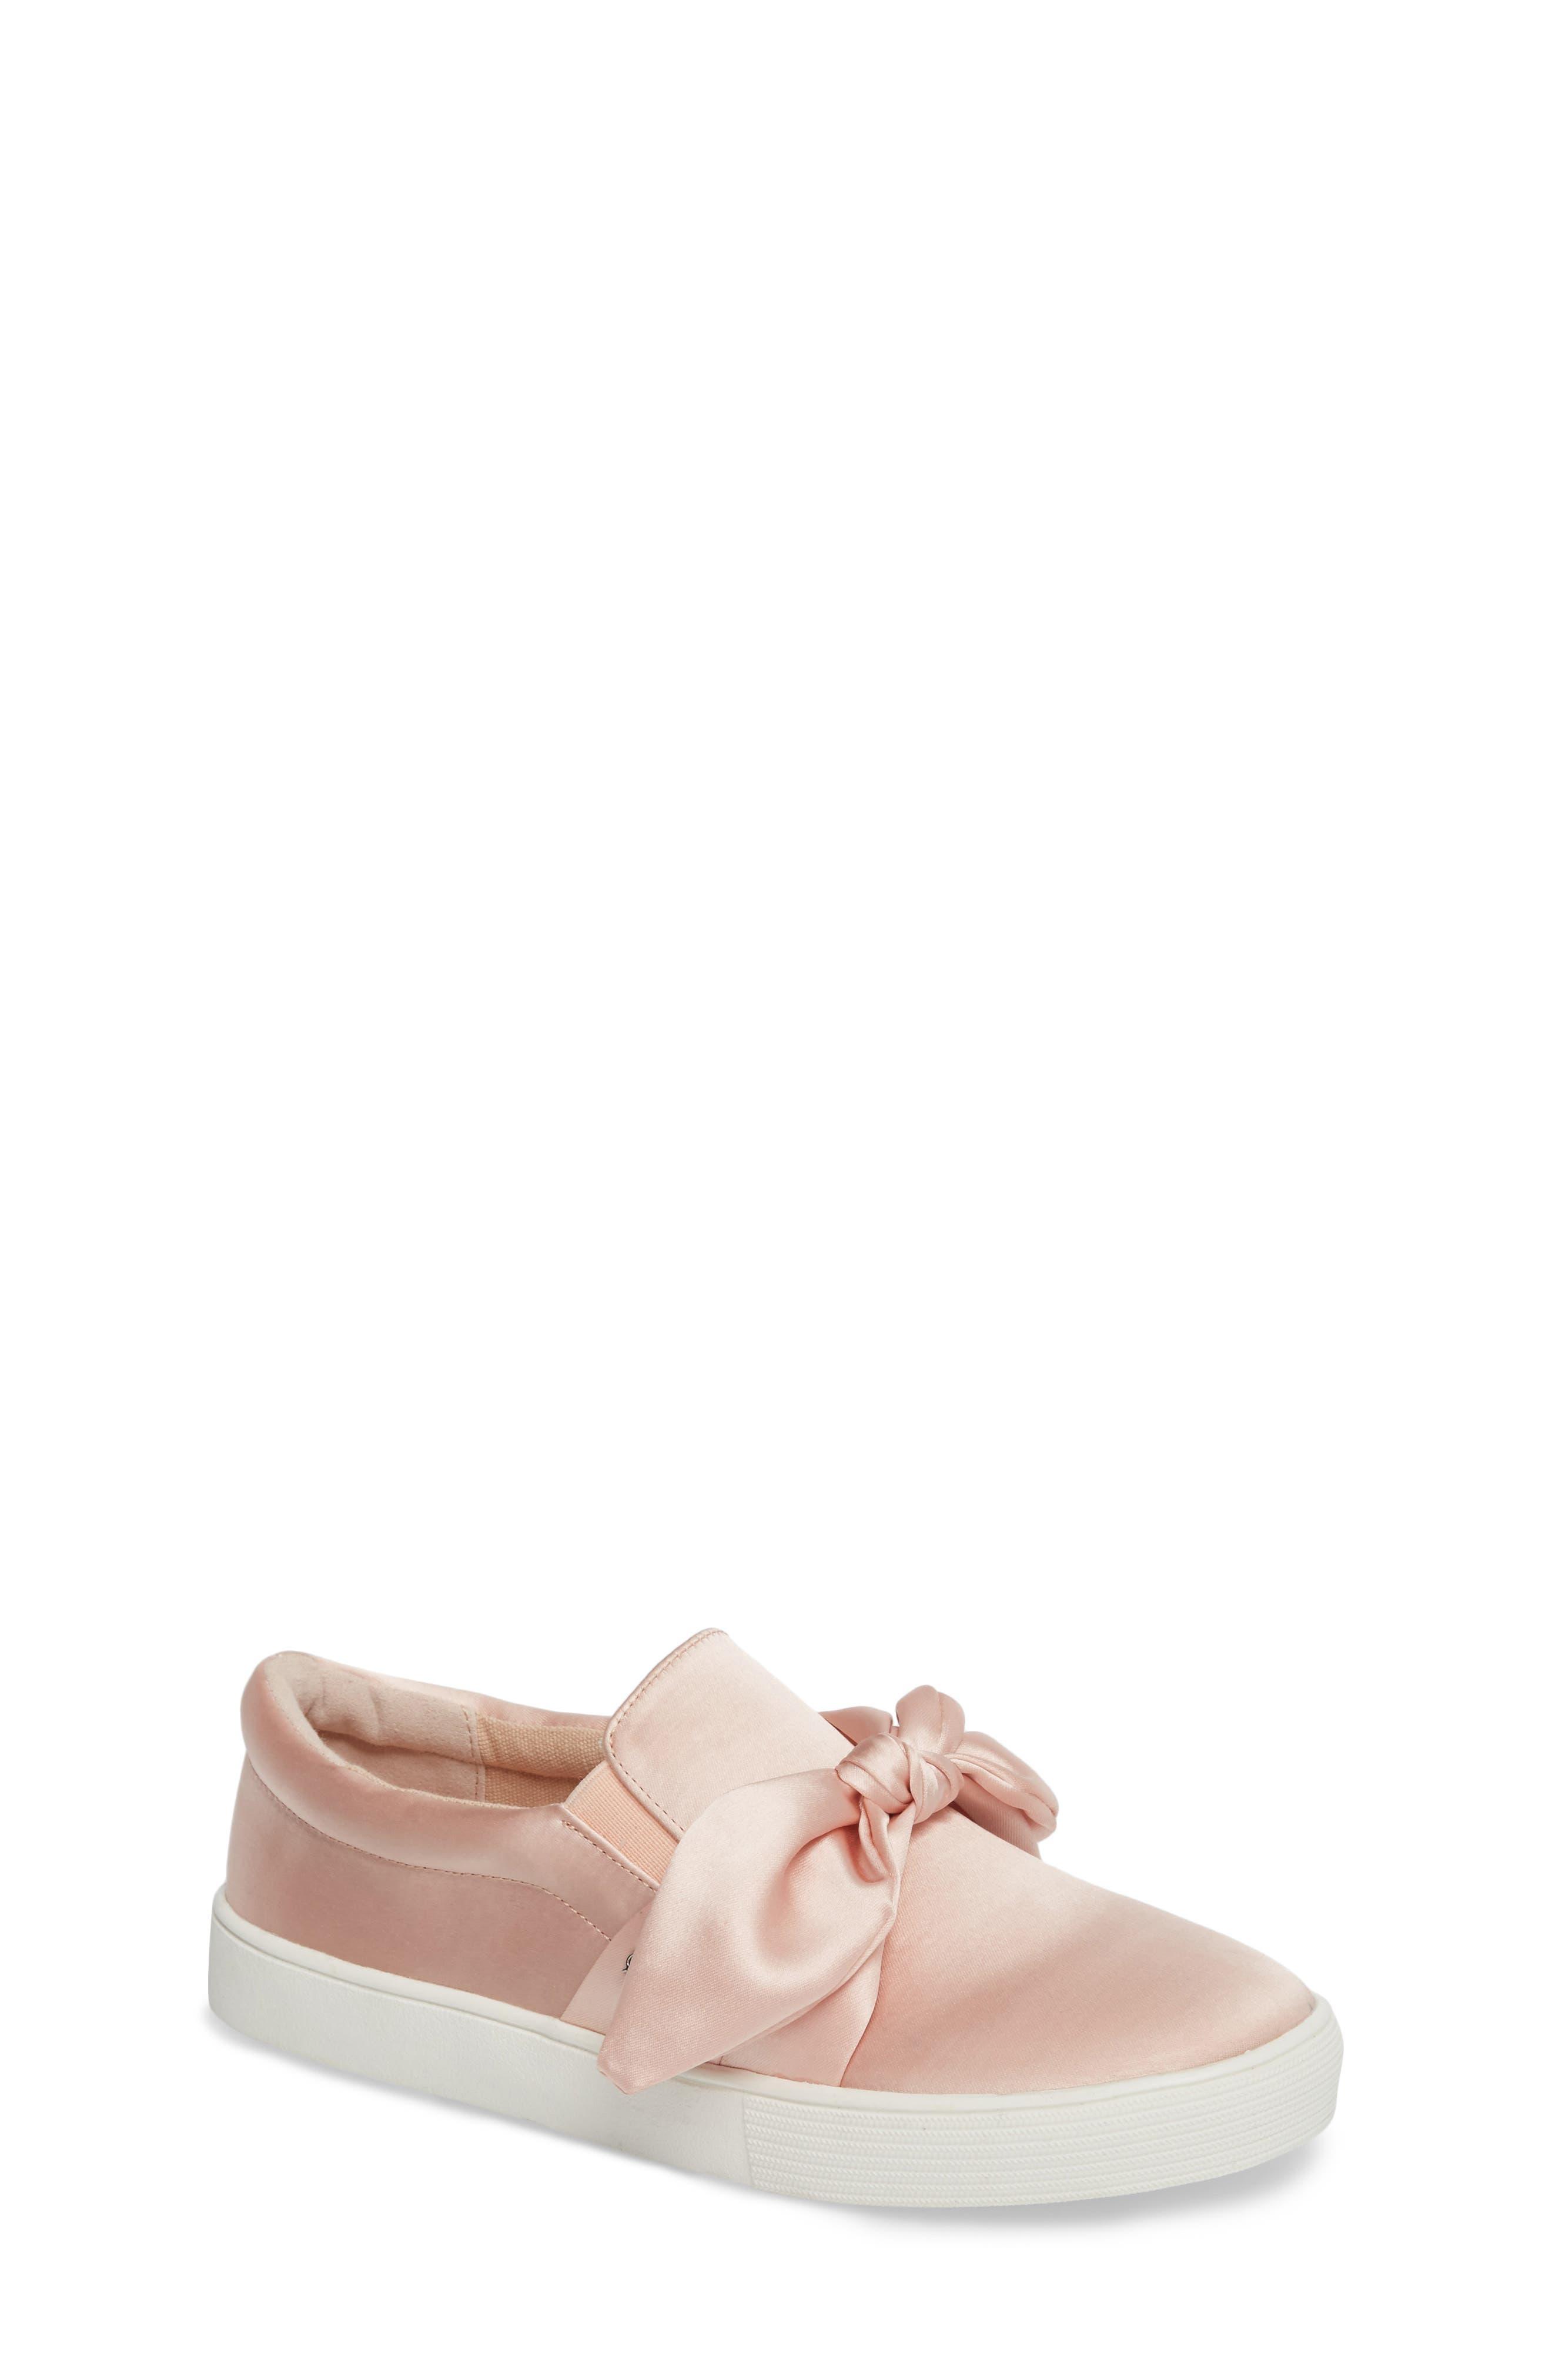 Bella Eden Slip-On Sneaker,                         Main,                         color, Blush Satin